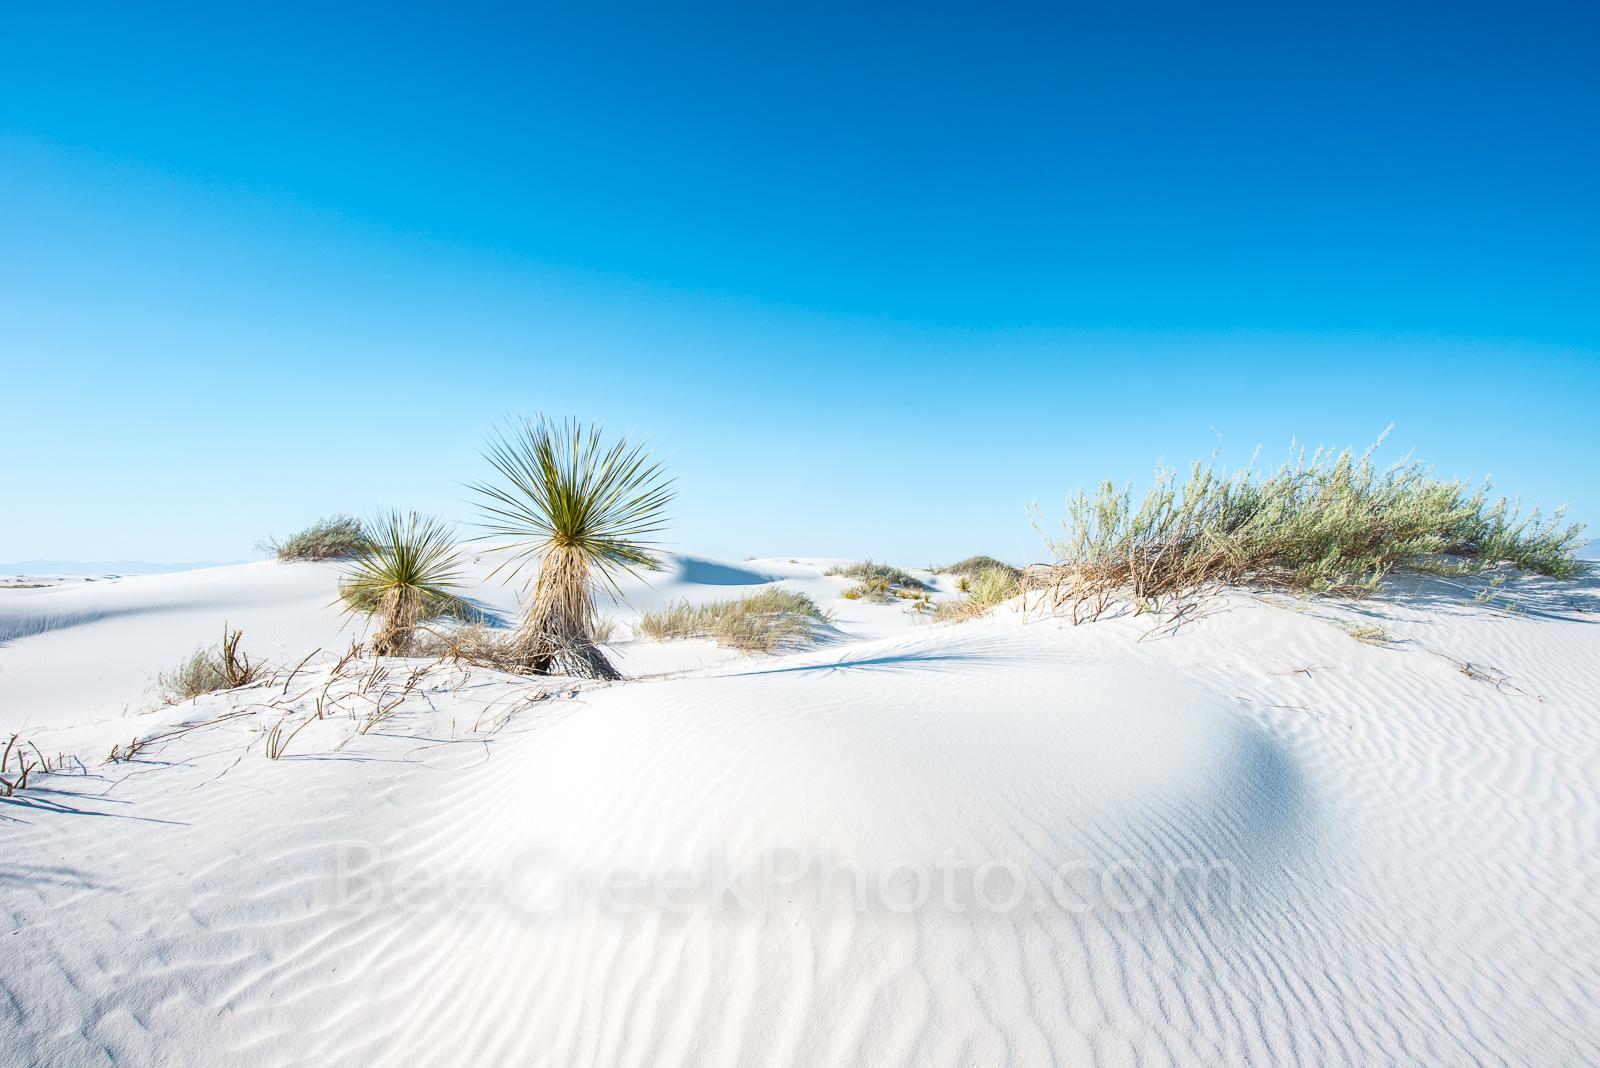 Desert dunes, landscape, new mexico, white sand National Monument, southern, NM, sandy, dunes, scenery, desert scenery,  southwestern US, , photo